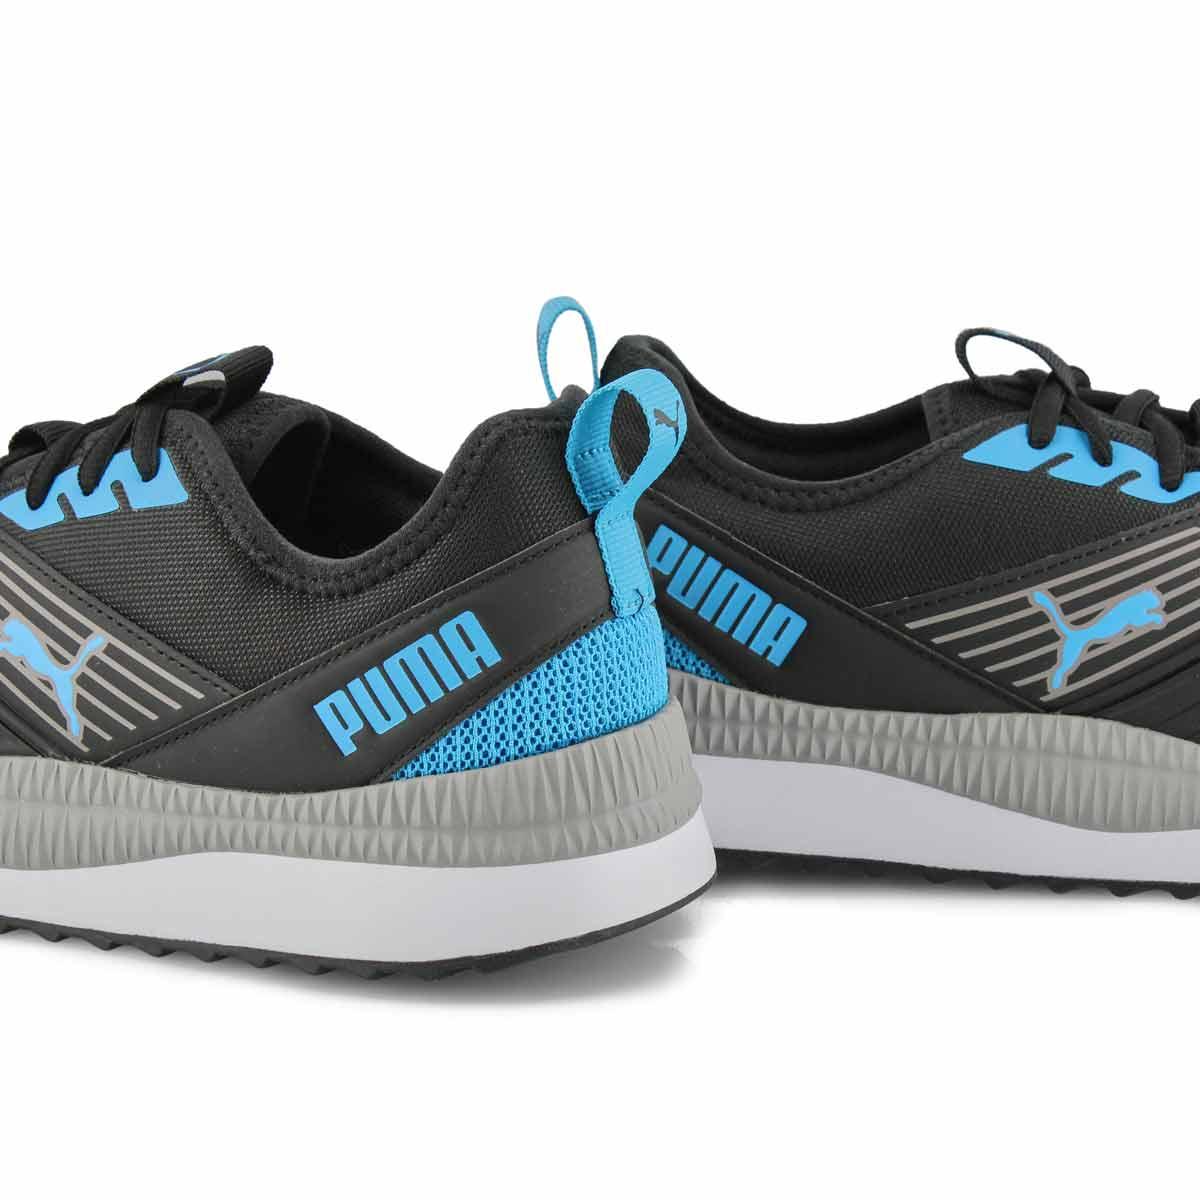 Men's Pacer Next  FFWD Sneaker - blk/blue